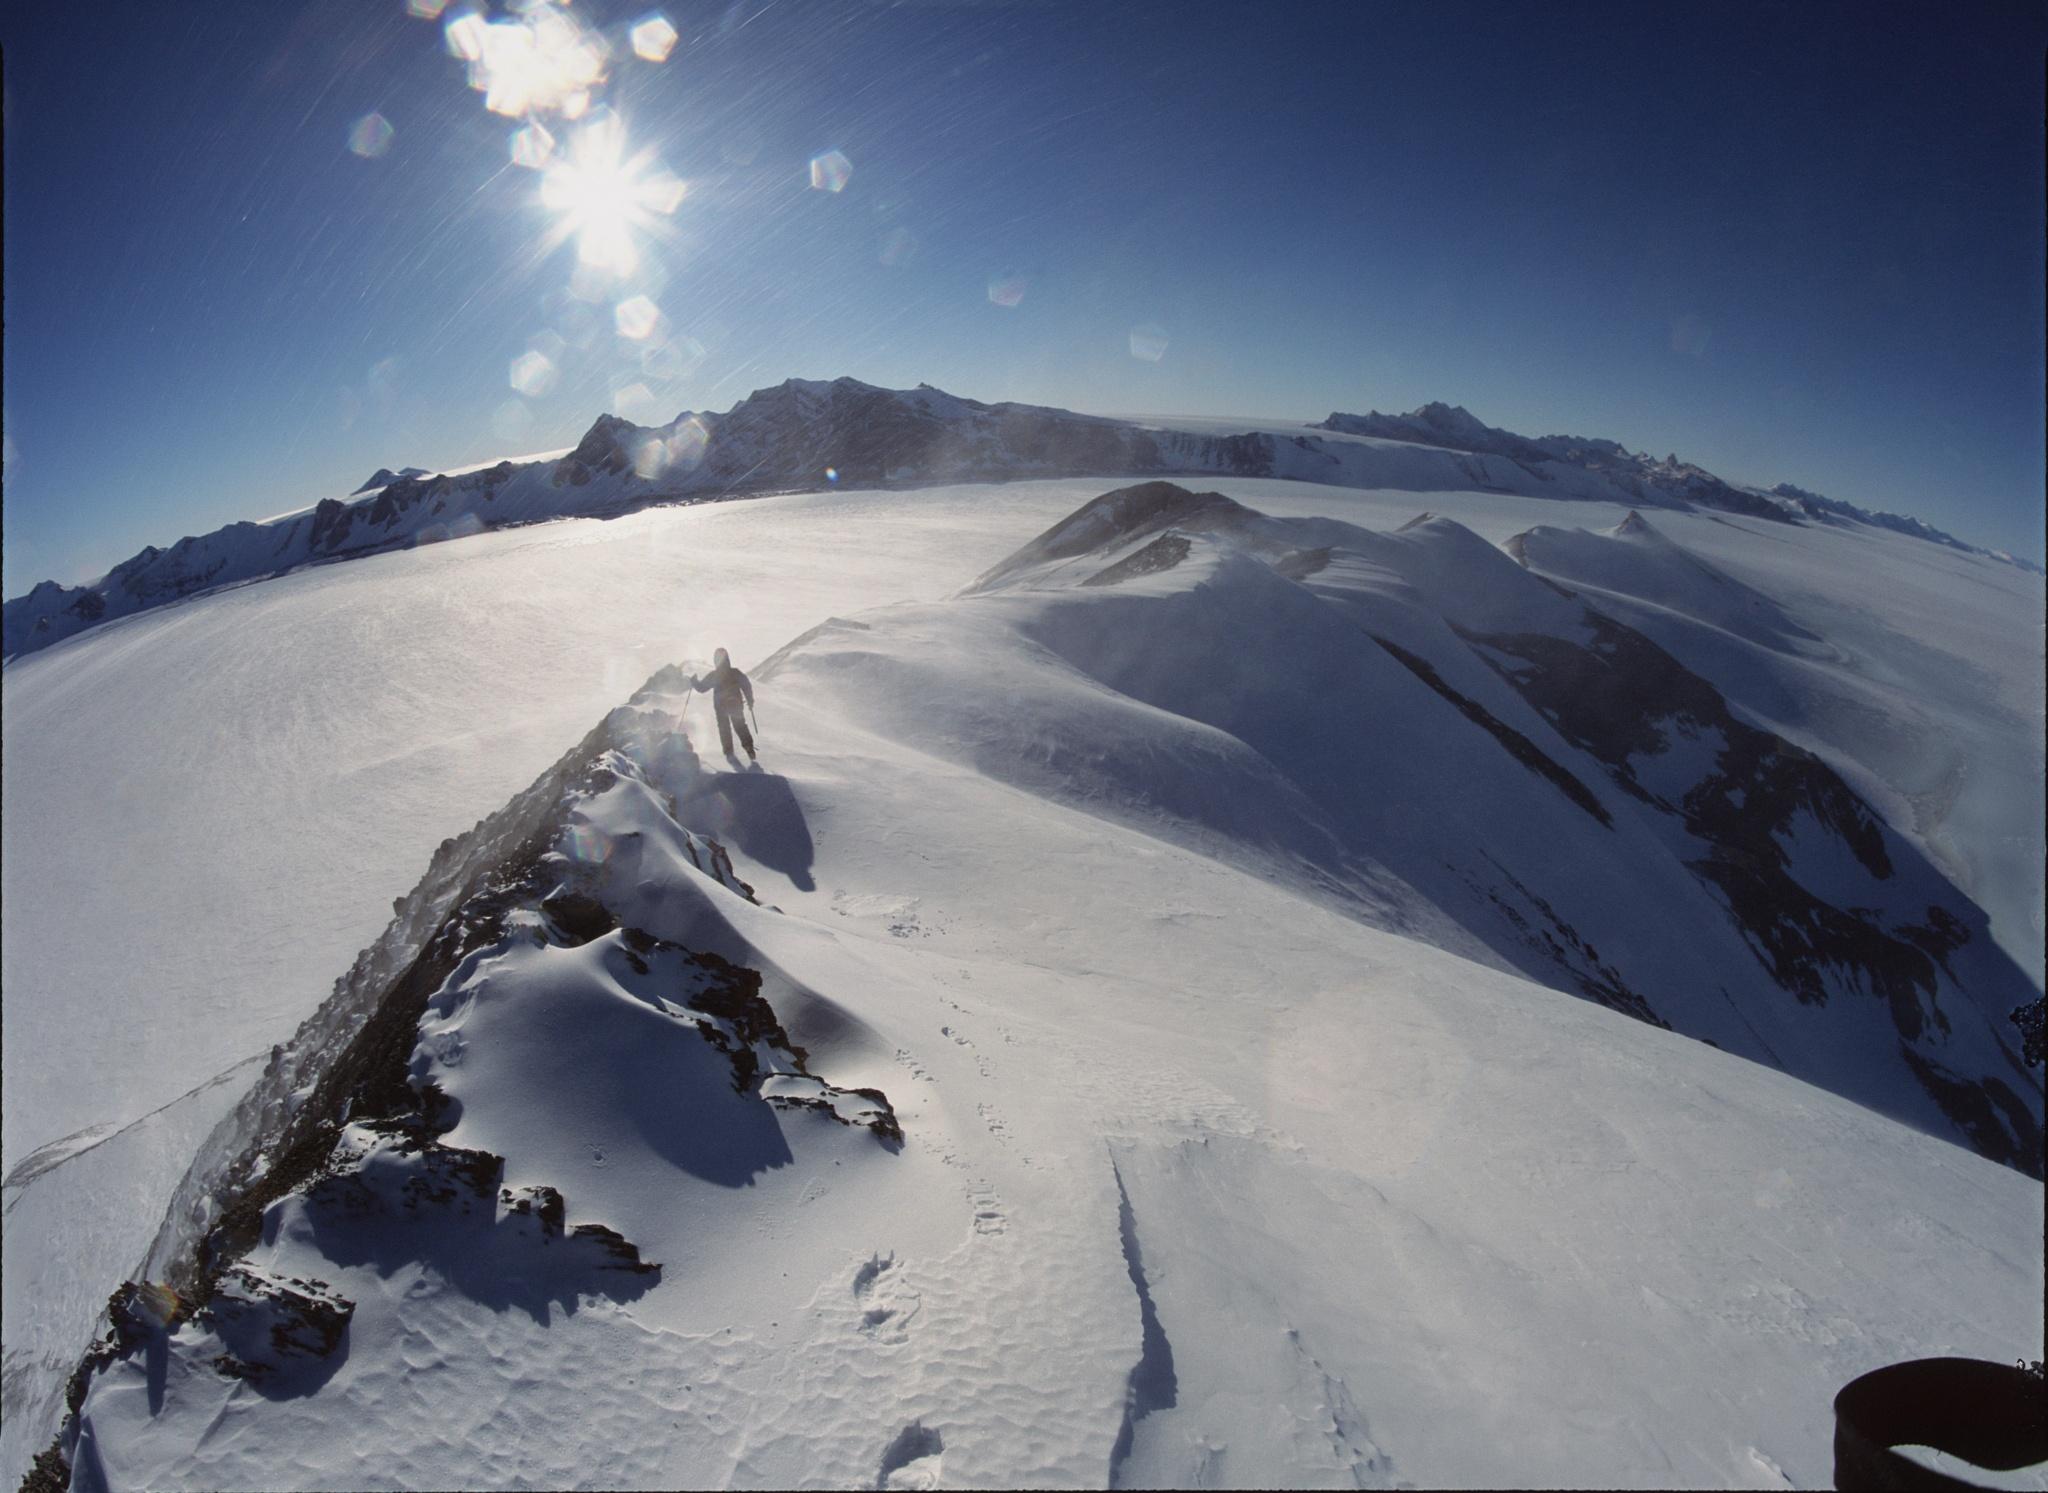 Midnight Summit, Antarctica by Martin Hartley